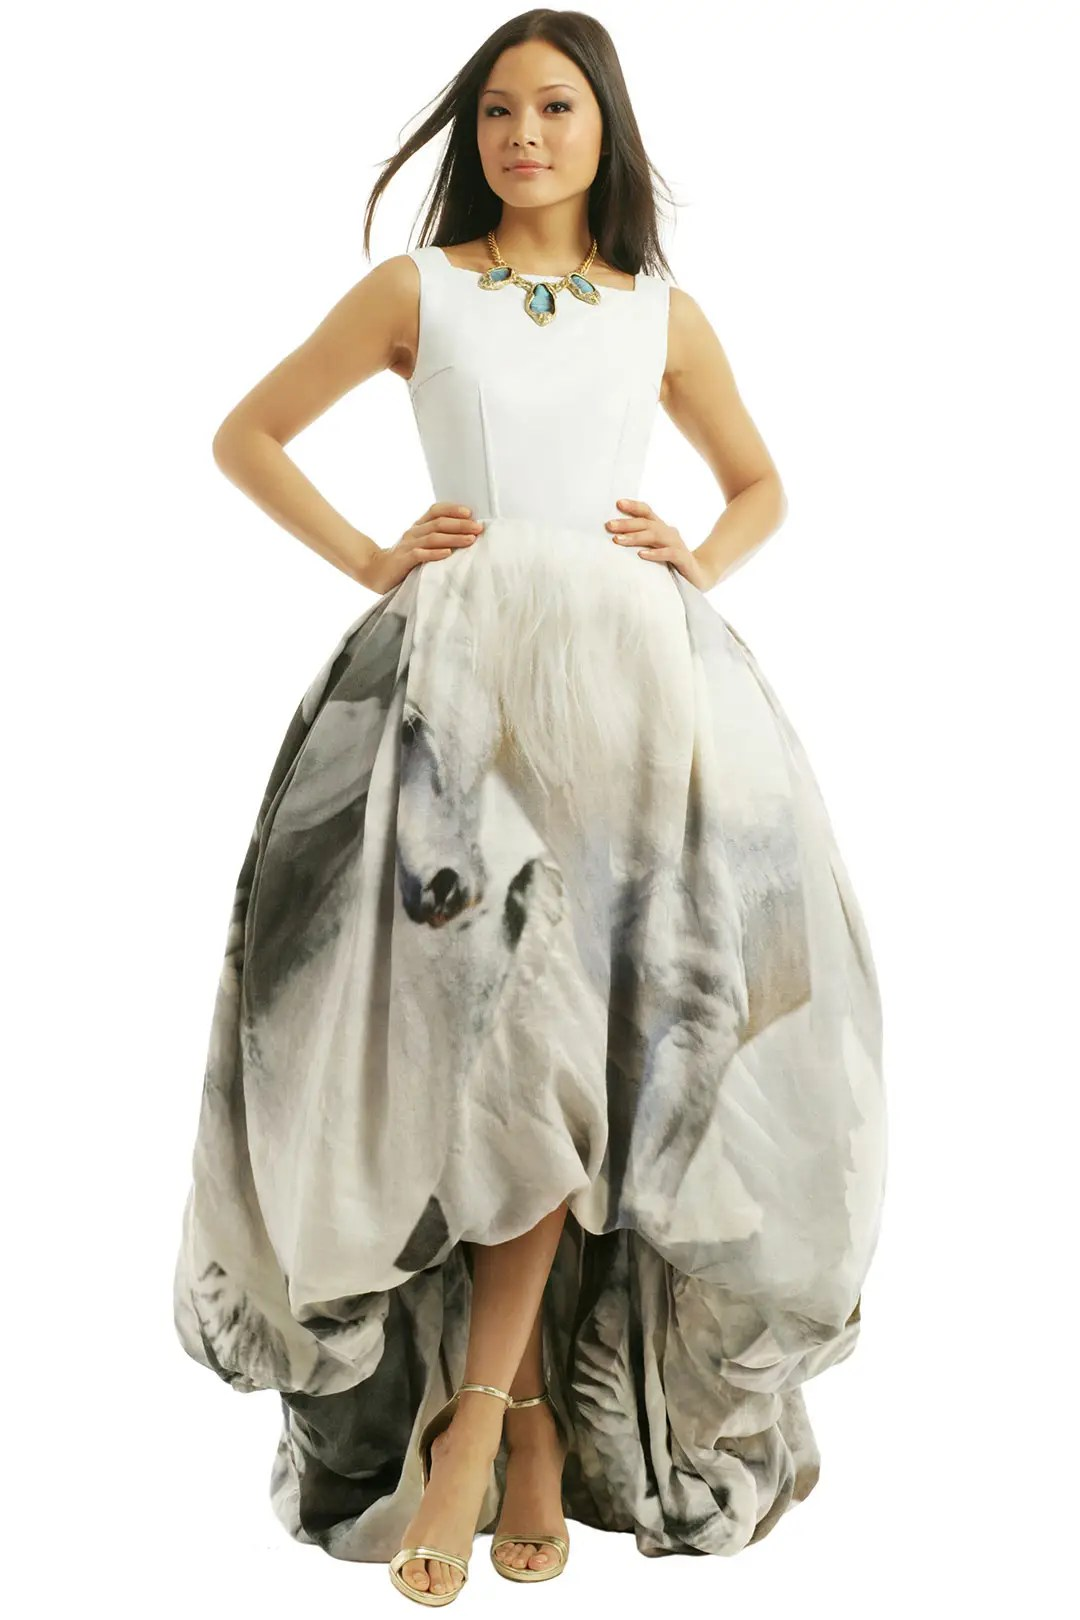 pegasusgown wedding dress for rent Pegasus Gown rental